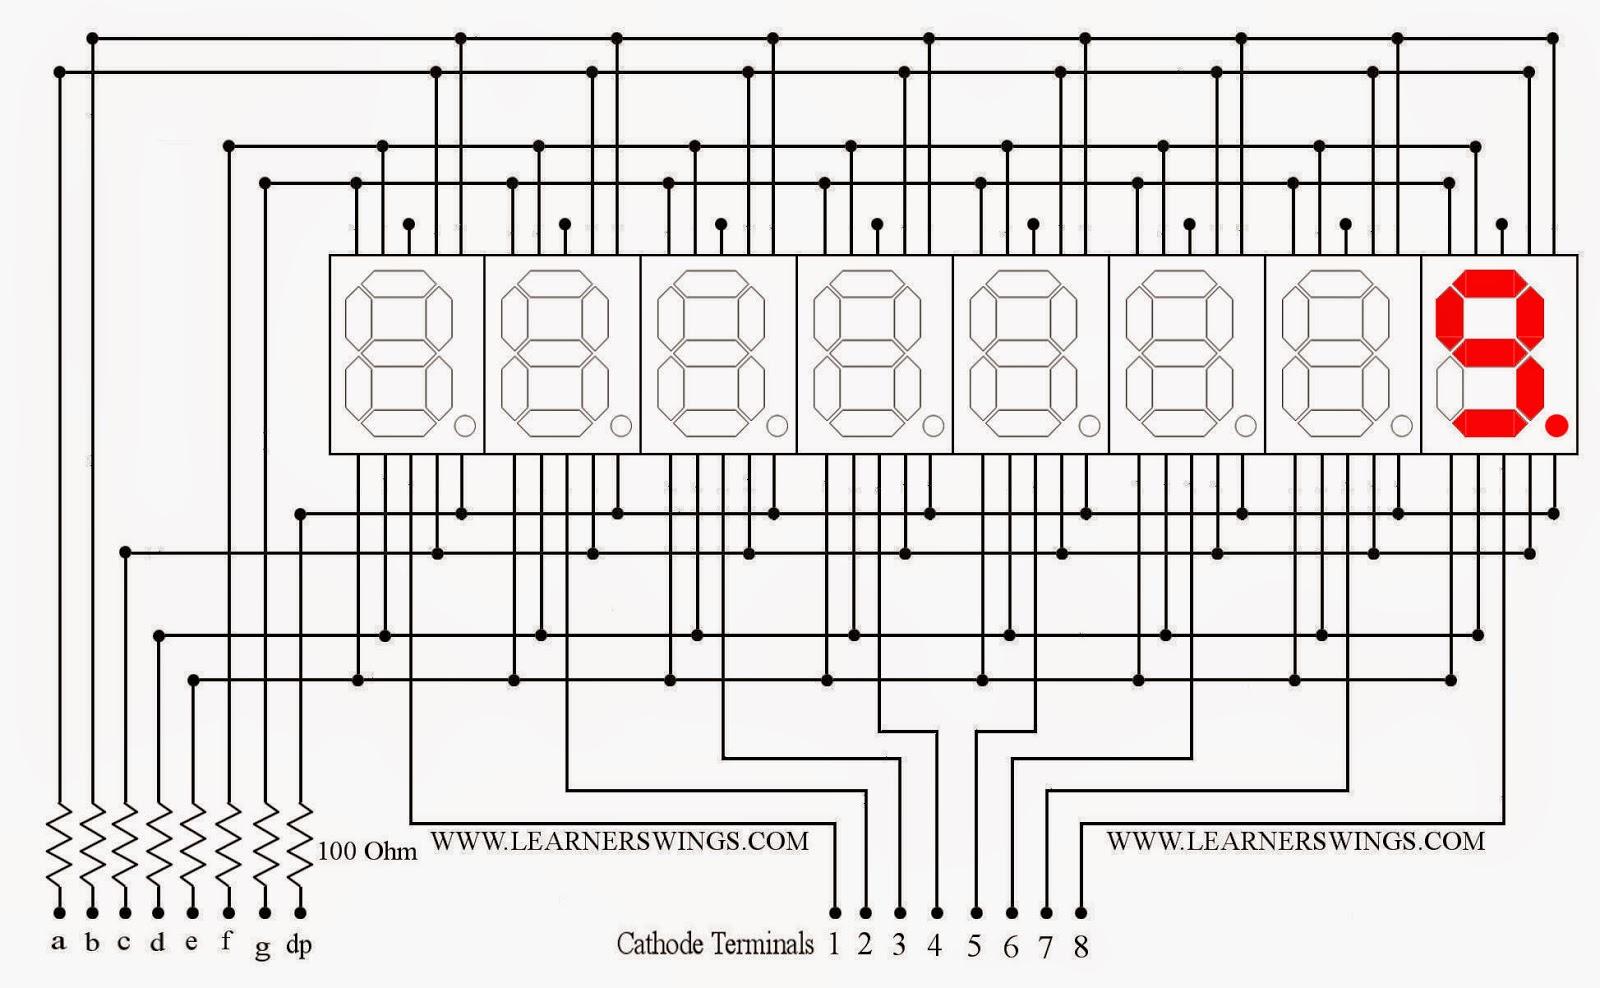 Improve the Brightness of a Cluster of Seven Segment